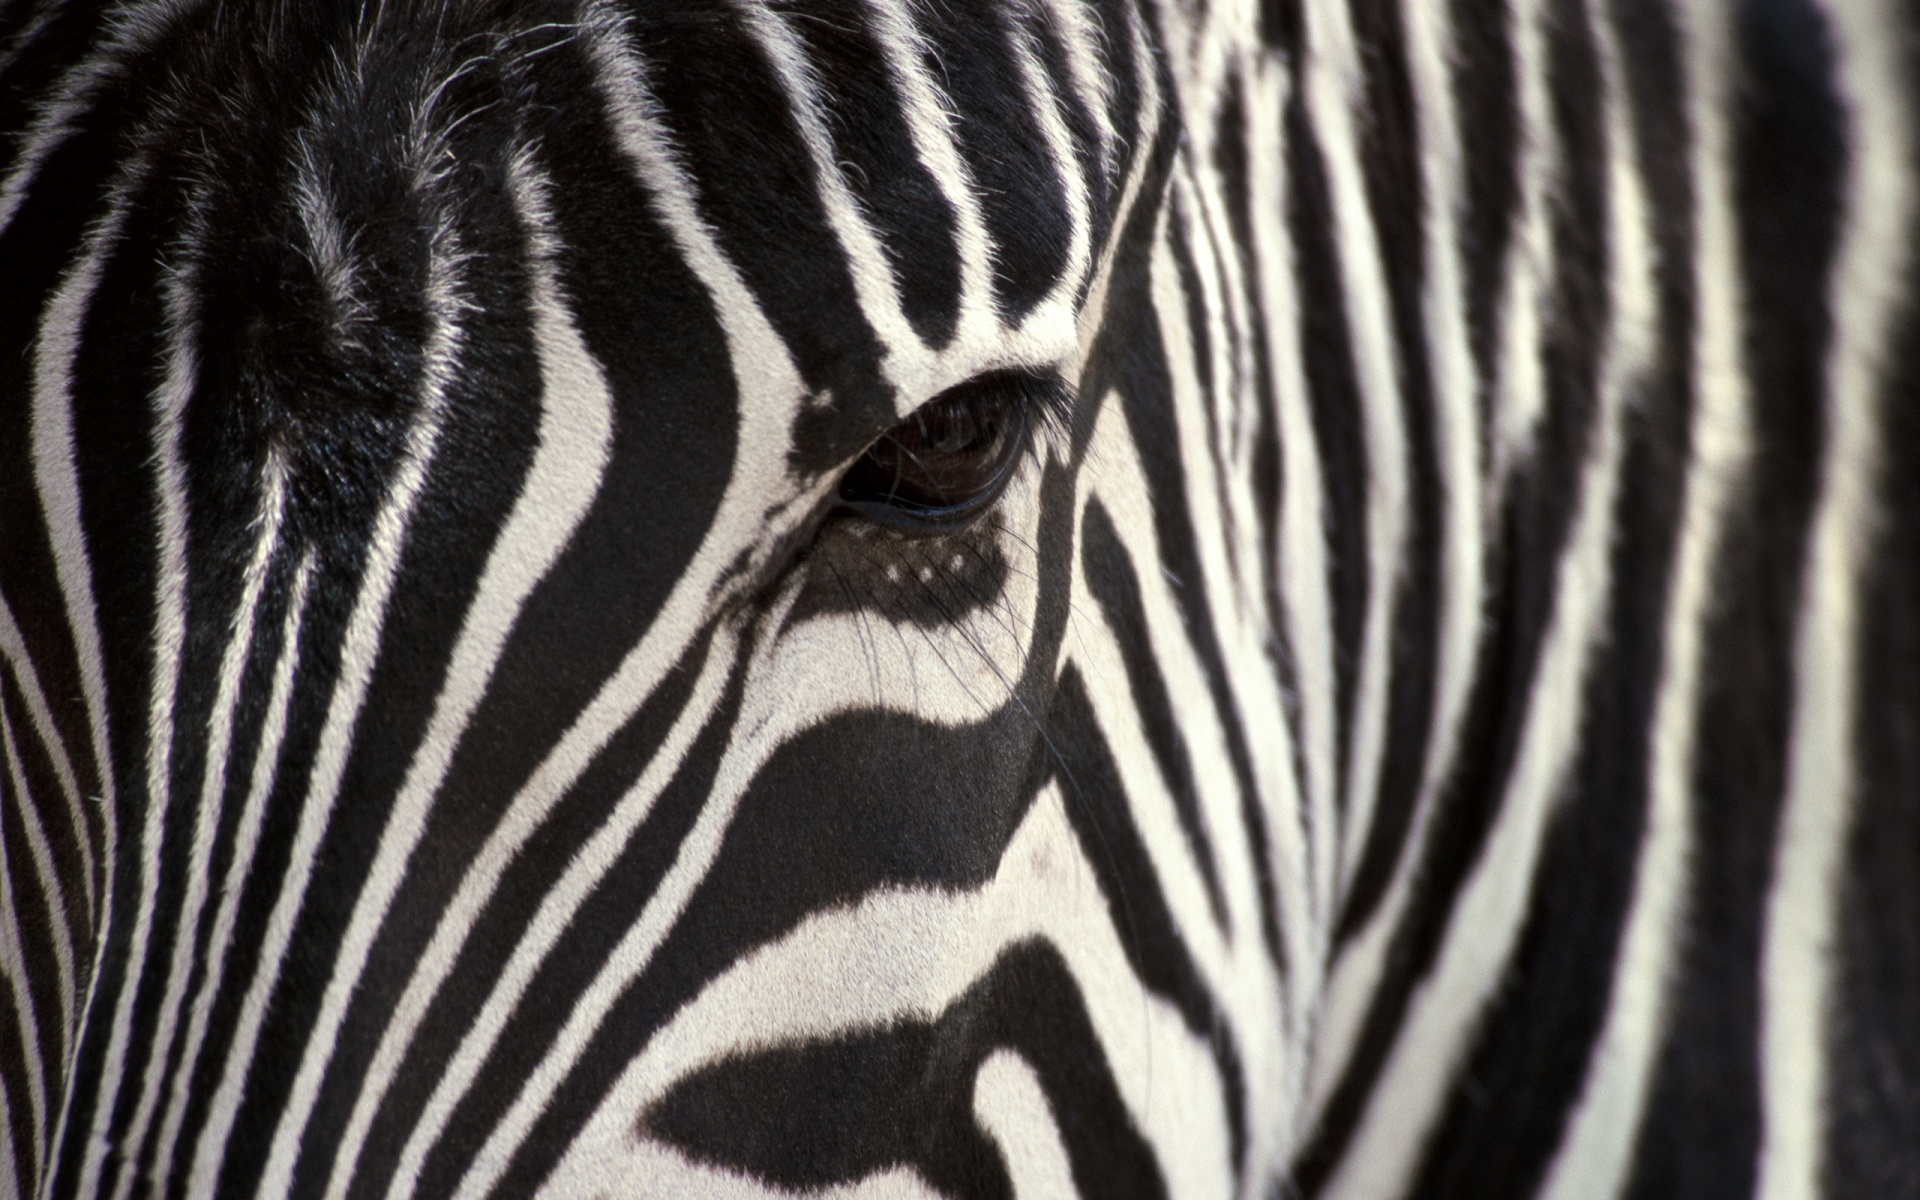 Zebra widescreen wallpaper Animal print desktop downloadable printable 1920x1200